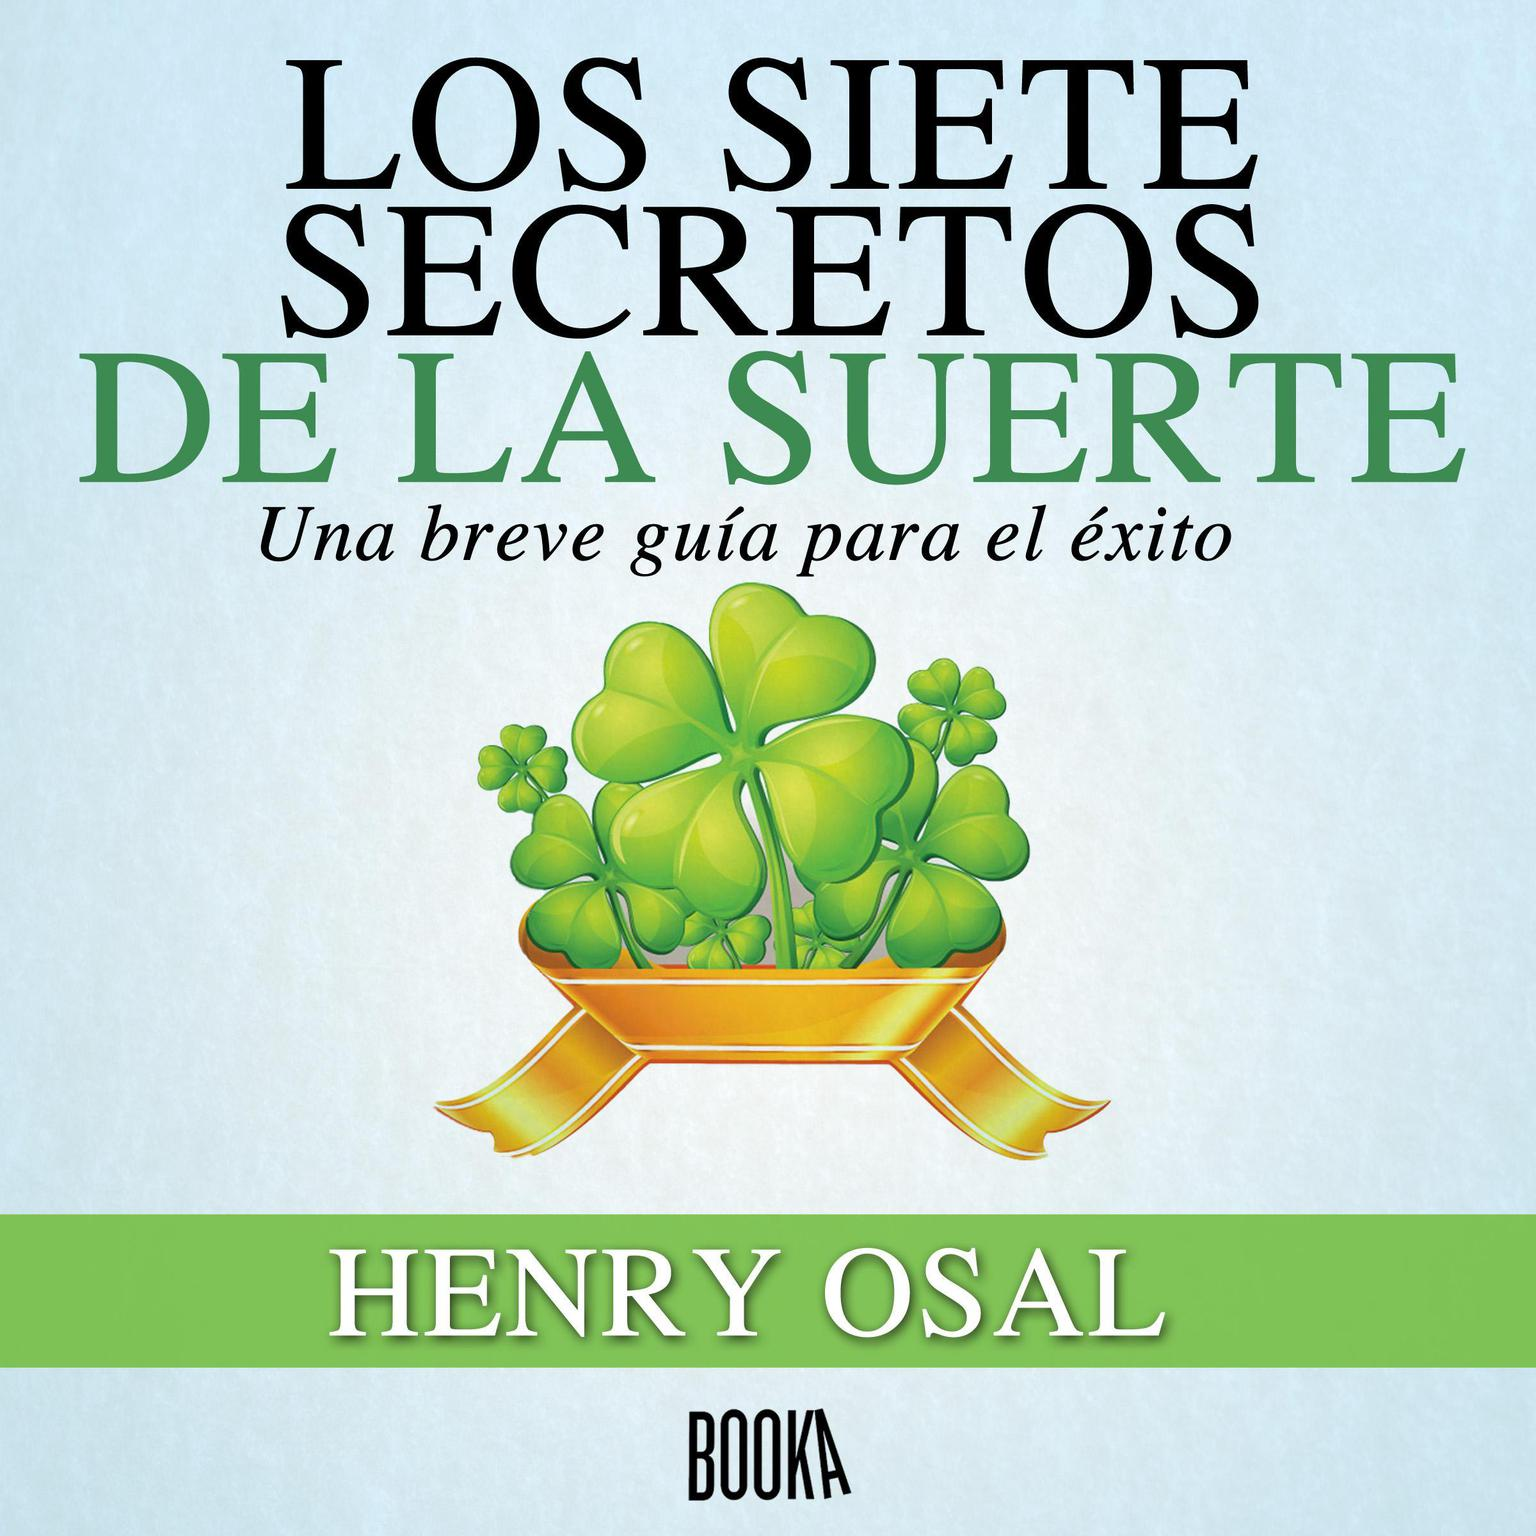 Los Siete Secretos de la Suerte Audiobook, by Henry Osal